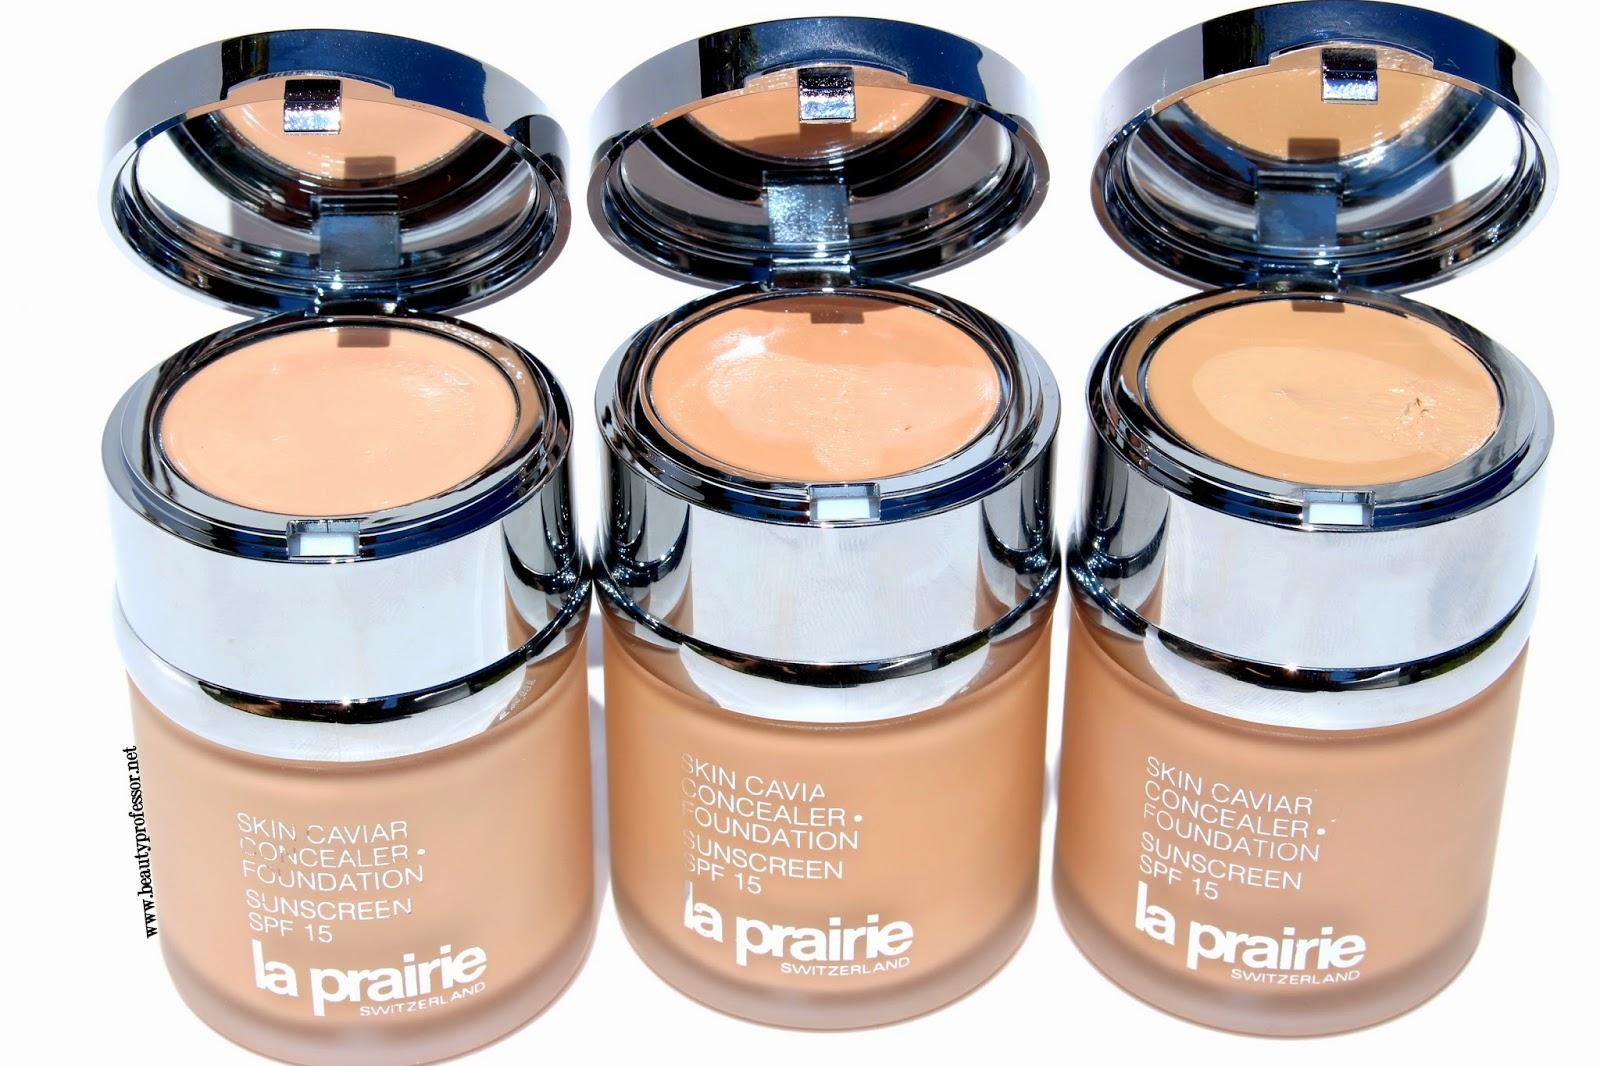 la prairie skin caviar foundation